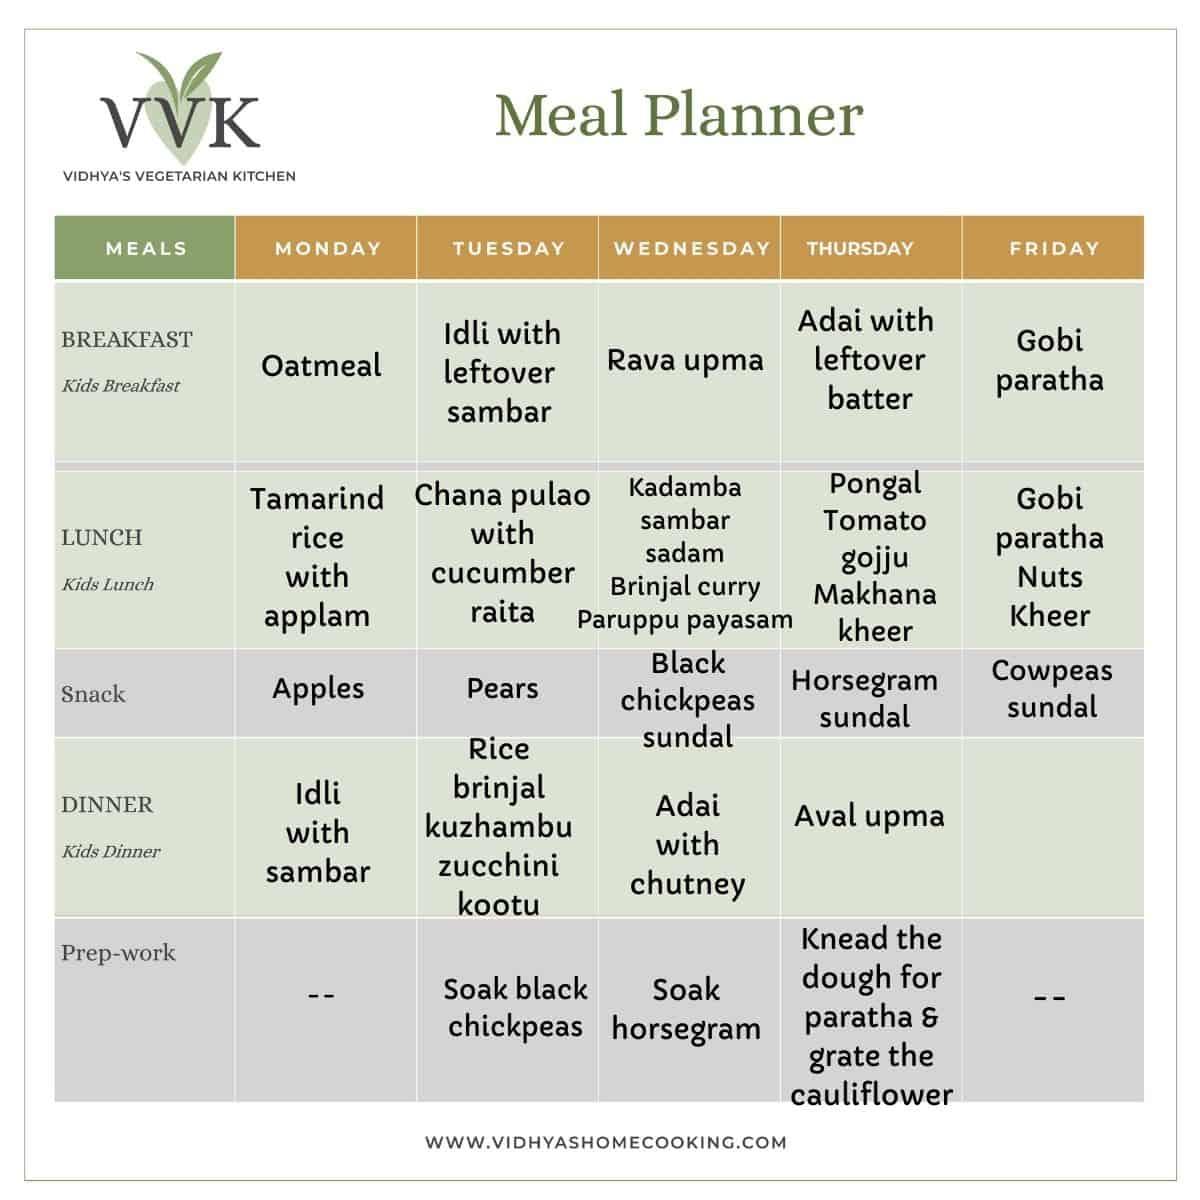 navratri-special weekly meal planner. VVK meal planner template.